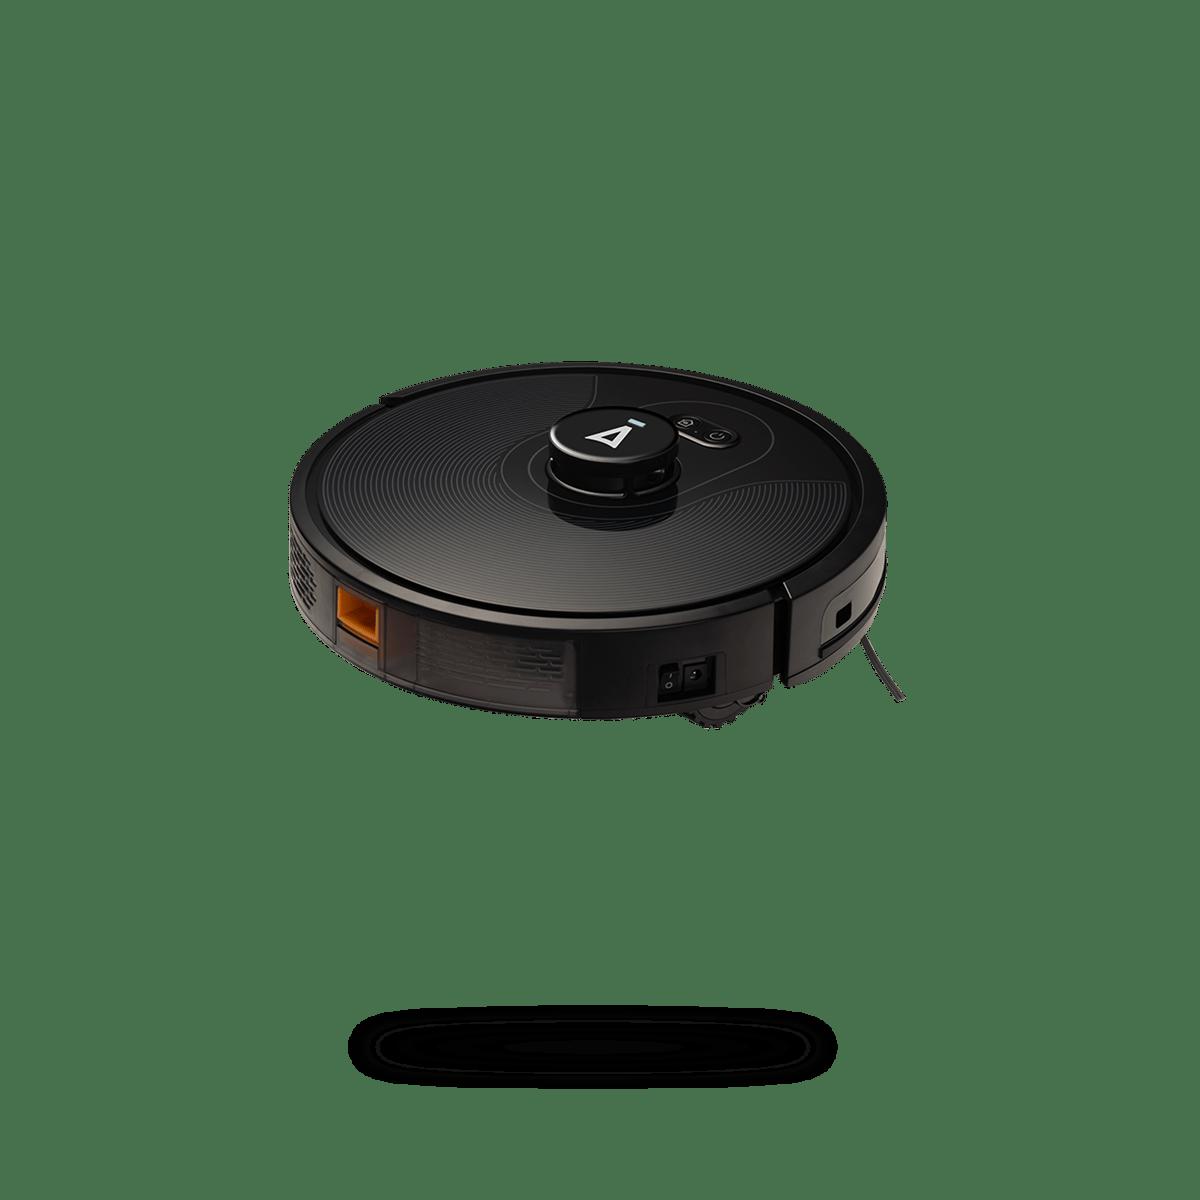 HC103 Robotstofzuiger